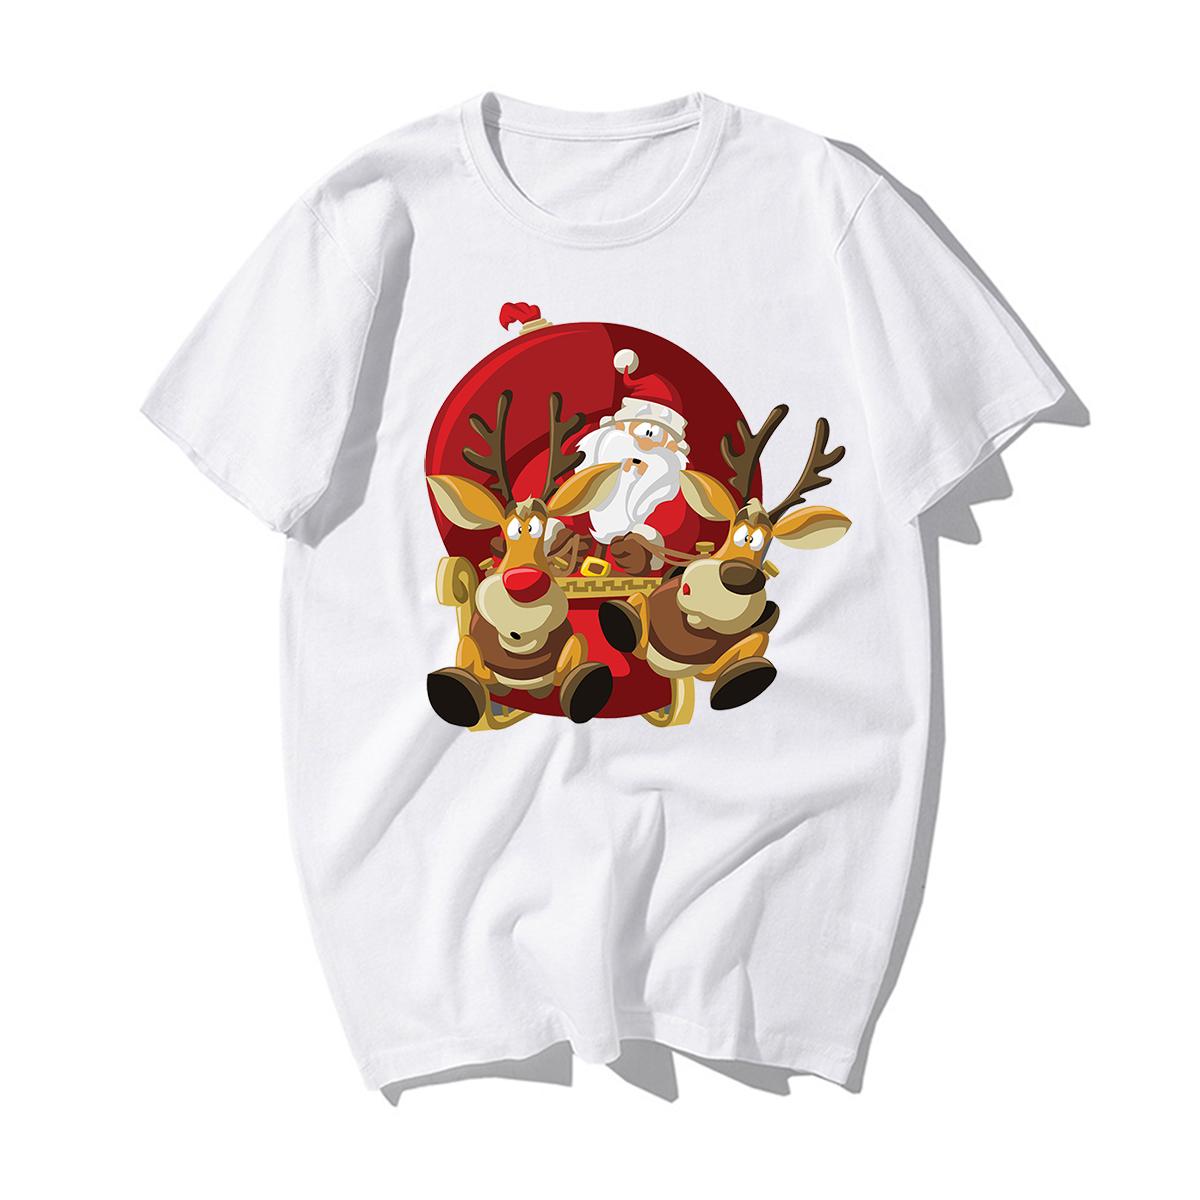 Funny Santa Claus Reindeer T-Shirt Happy New Year T-shirts Men Merry Christmas Tshirts Casual Cotton Xmas Lovers Gift Tshirt Men